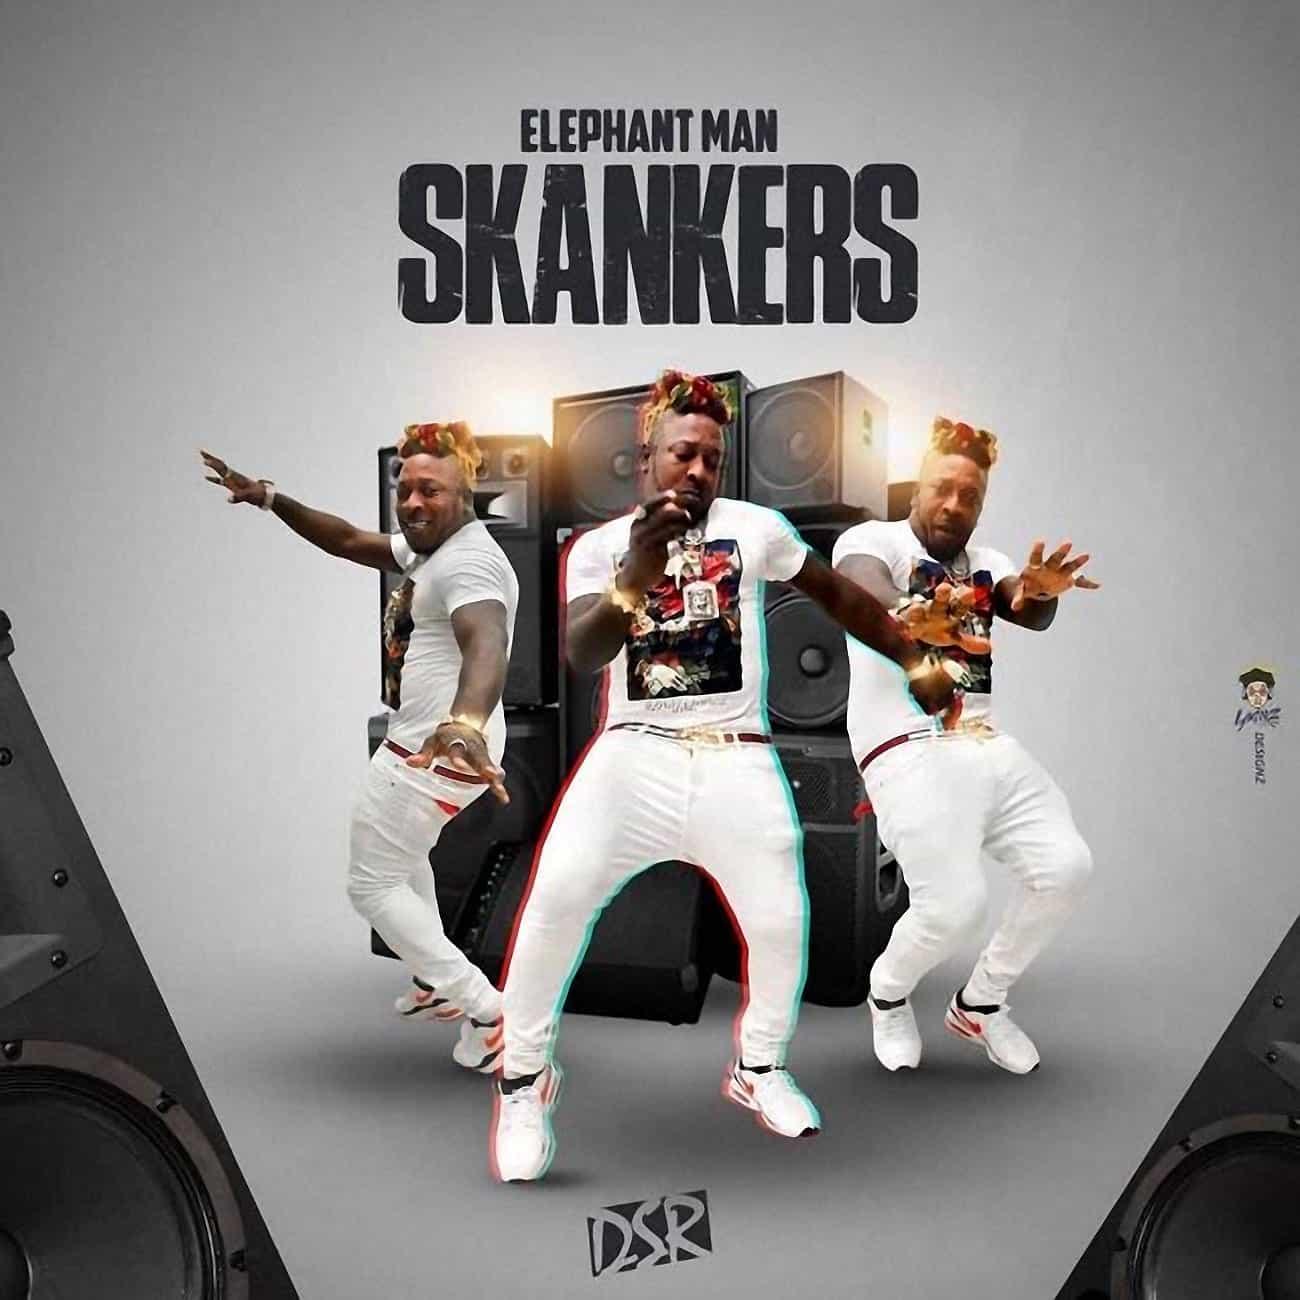 Elephant Man - Skankers - DSR / Bad Company - 2020 Dancehall